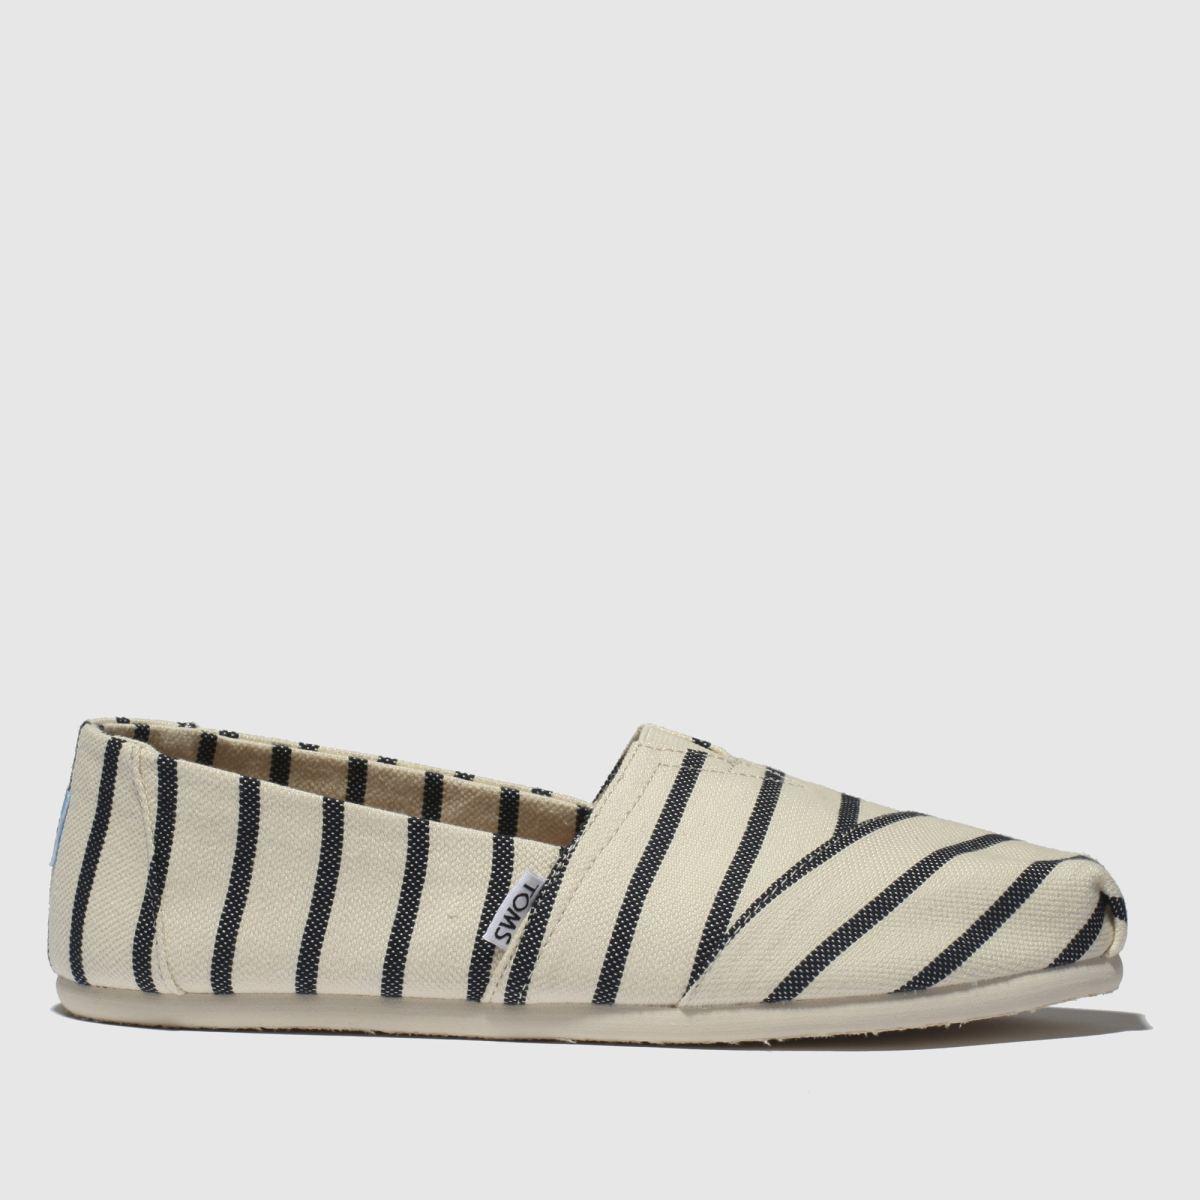 Toms White & Navy Alpargata Flat Shoes